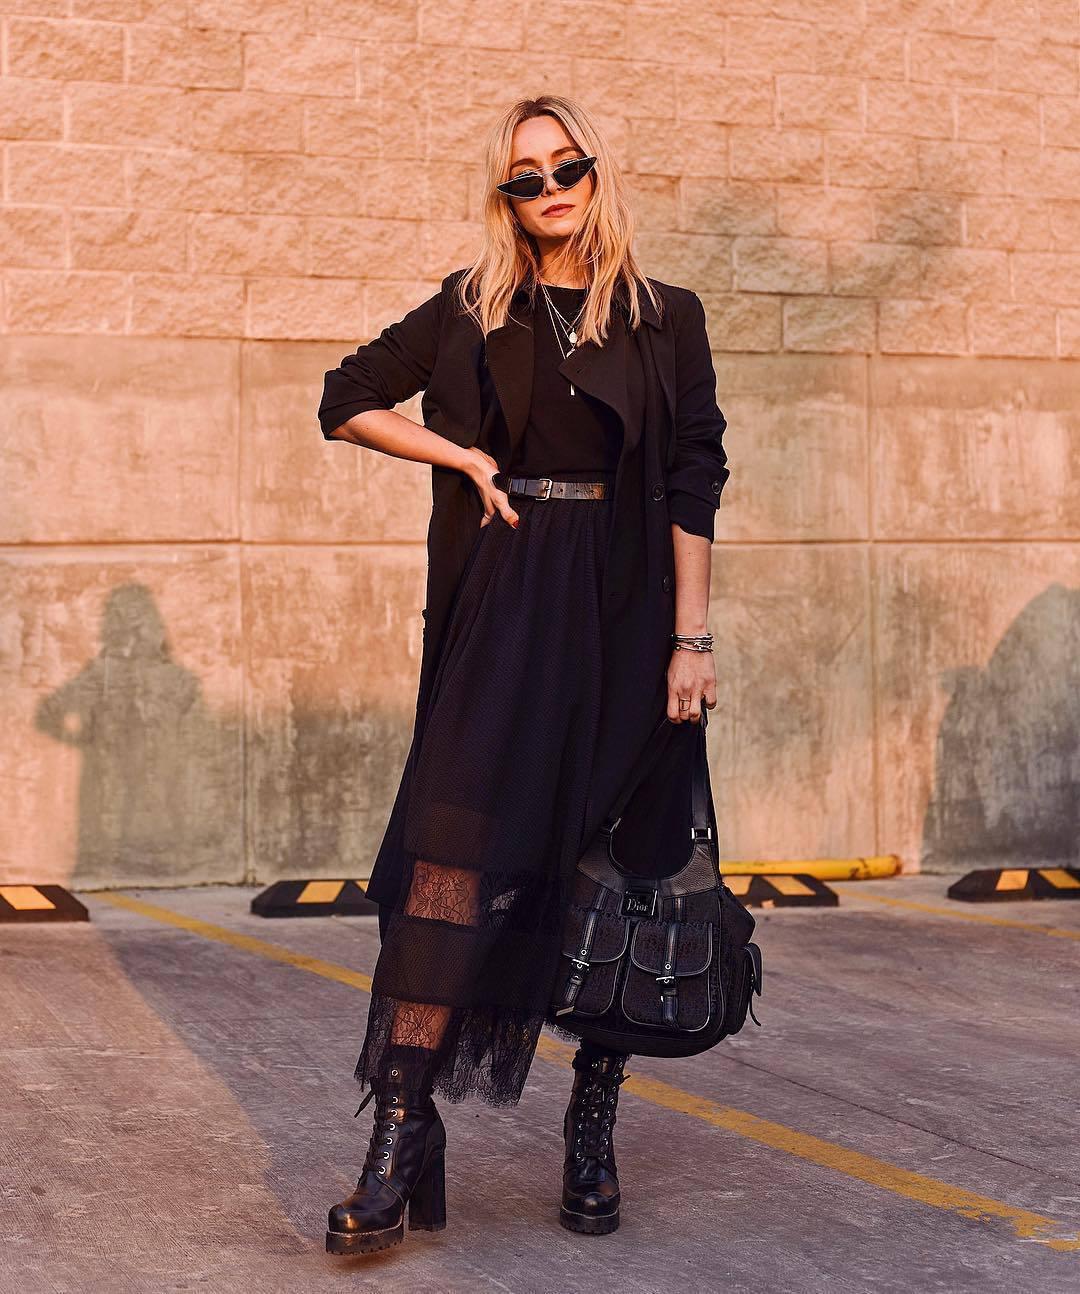 skirt black skirt lace skirt h&m black boots high heels boots black bag black coat trench coat black belt black top